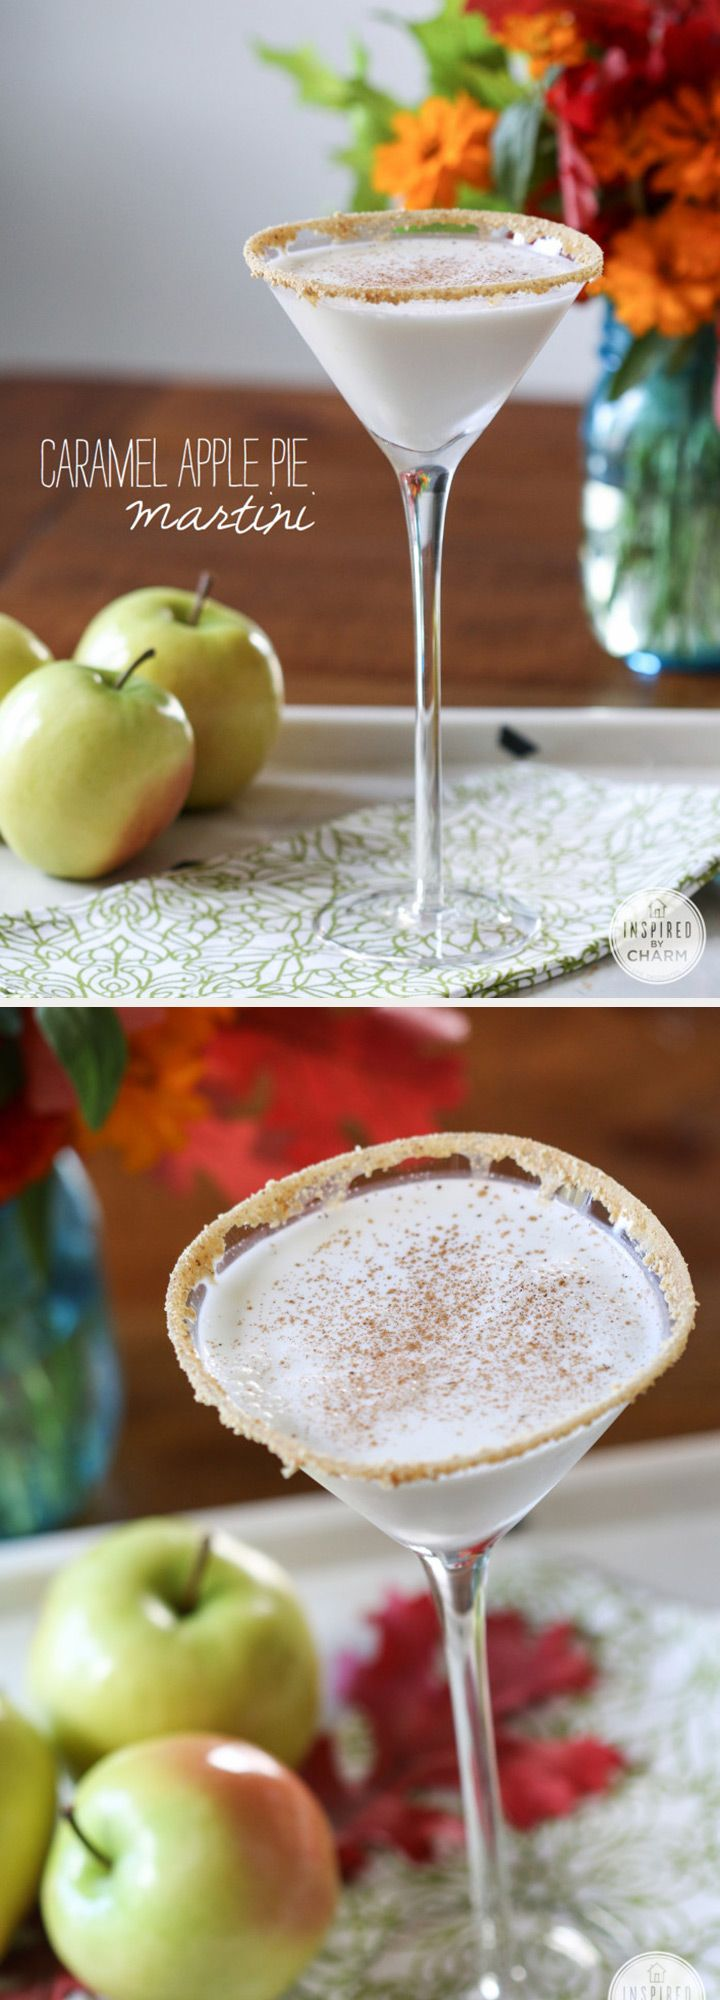 Caramel Apple Pie Martini - Fall Wedding Signature Drink - YUM!